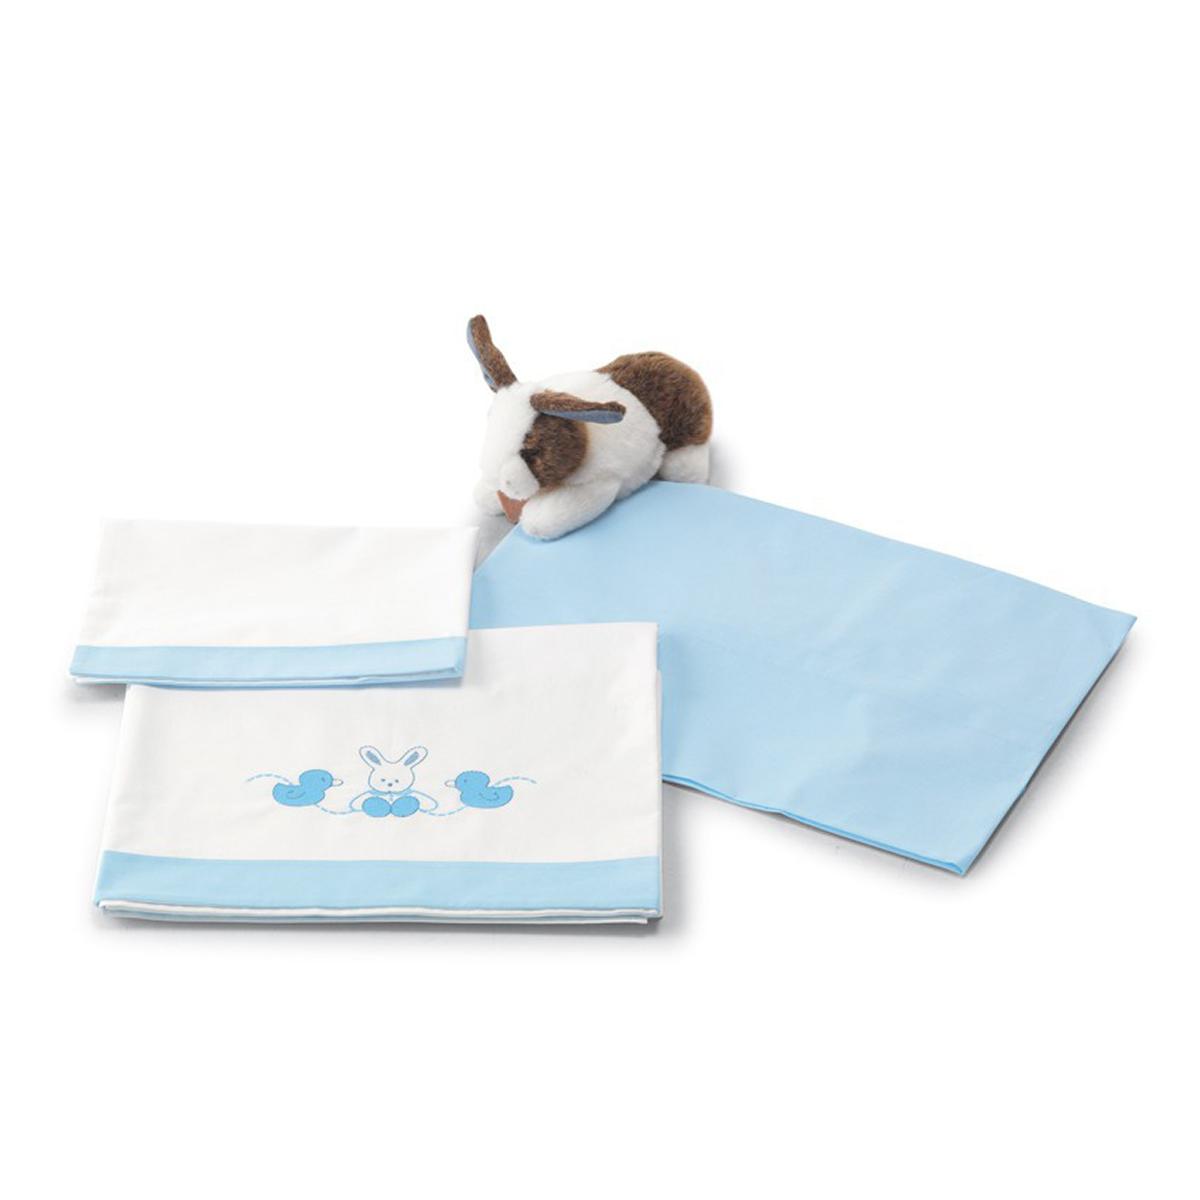 lenjerie de pat copii pali 3 piese tommy, azzurro